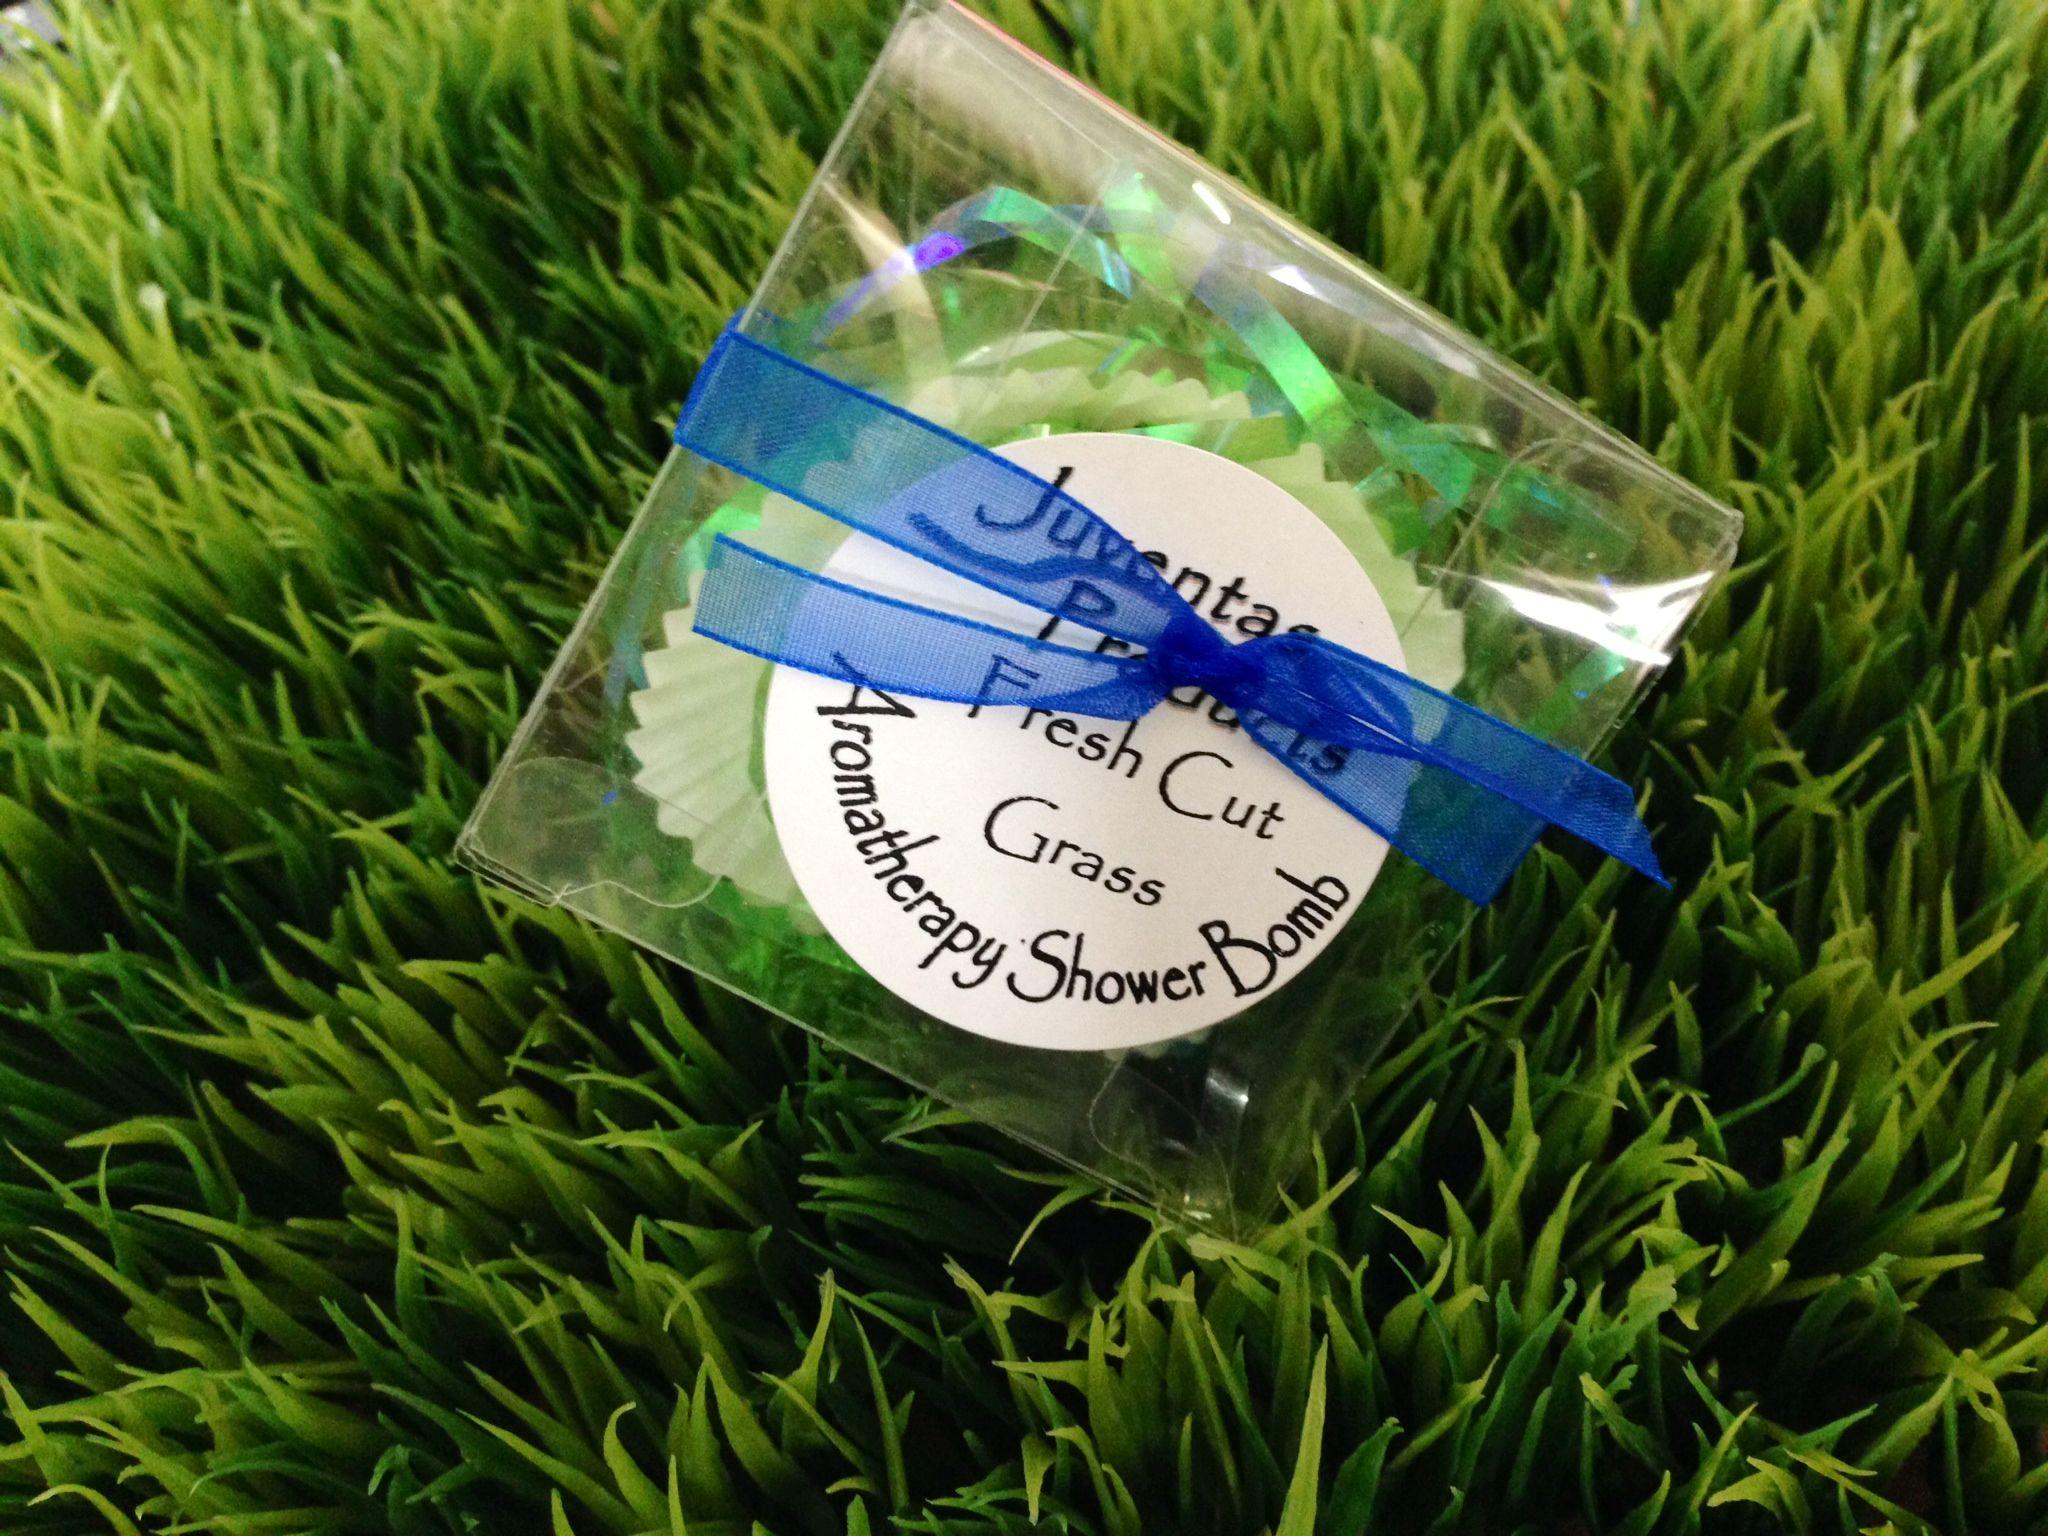 Aromatherapy Shower Bomb- Fresh Cut Grass